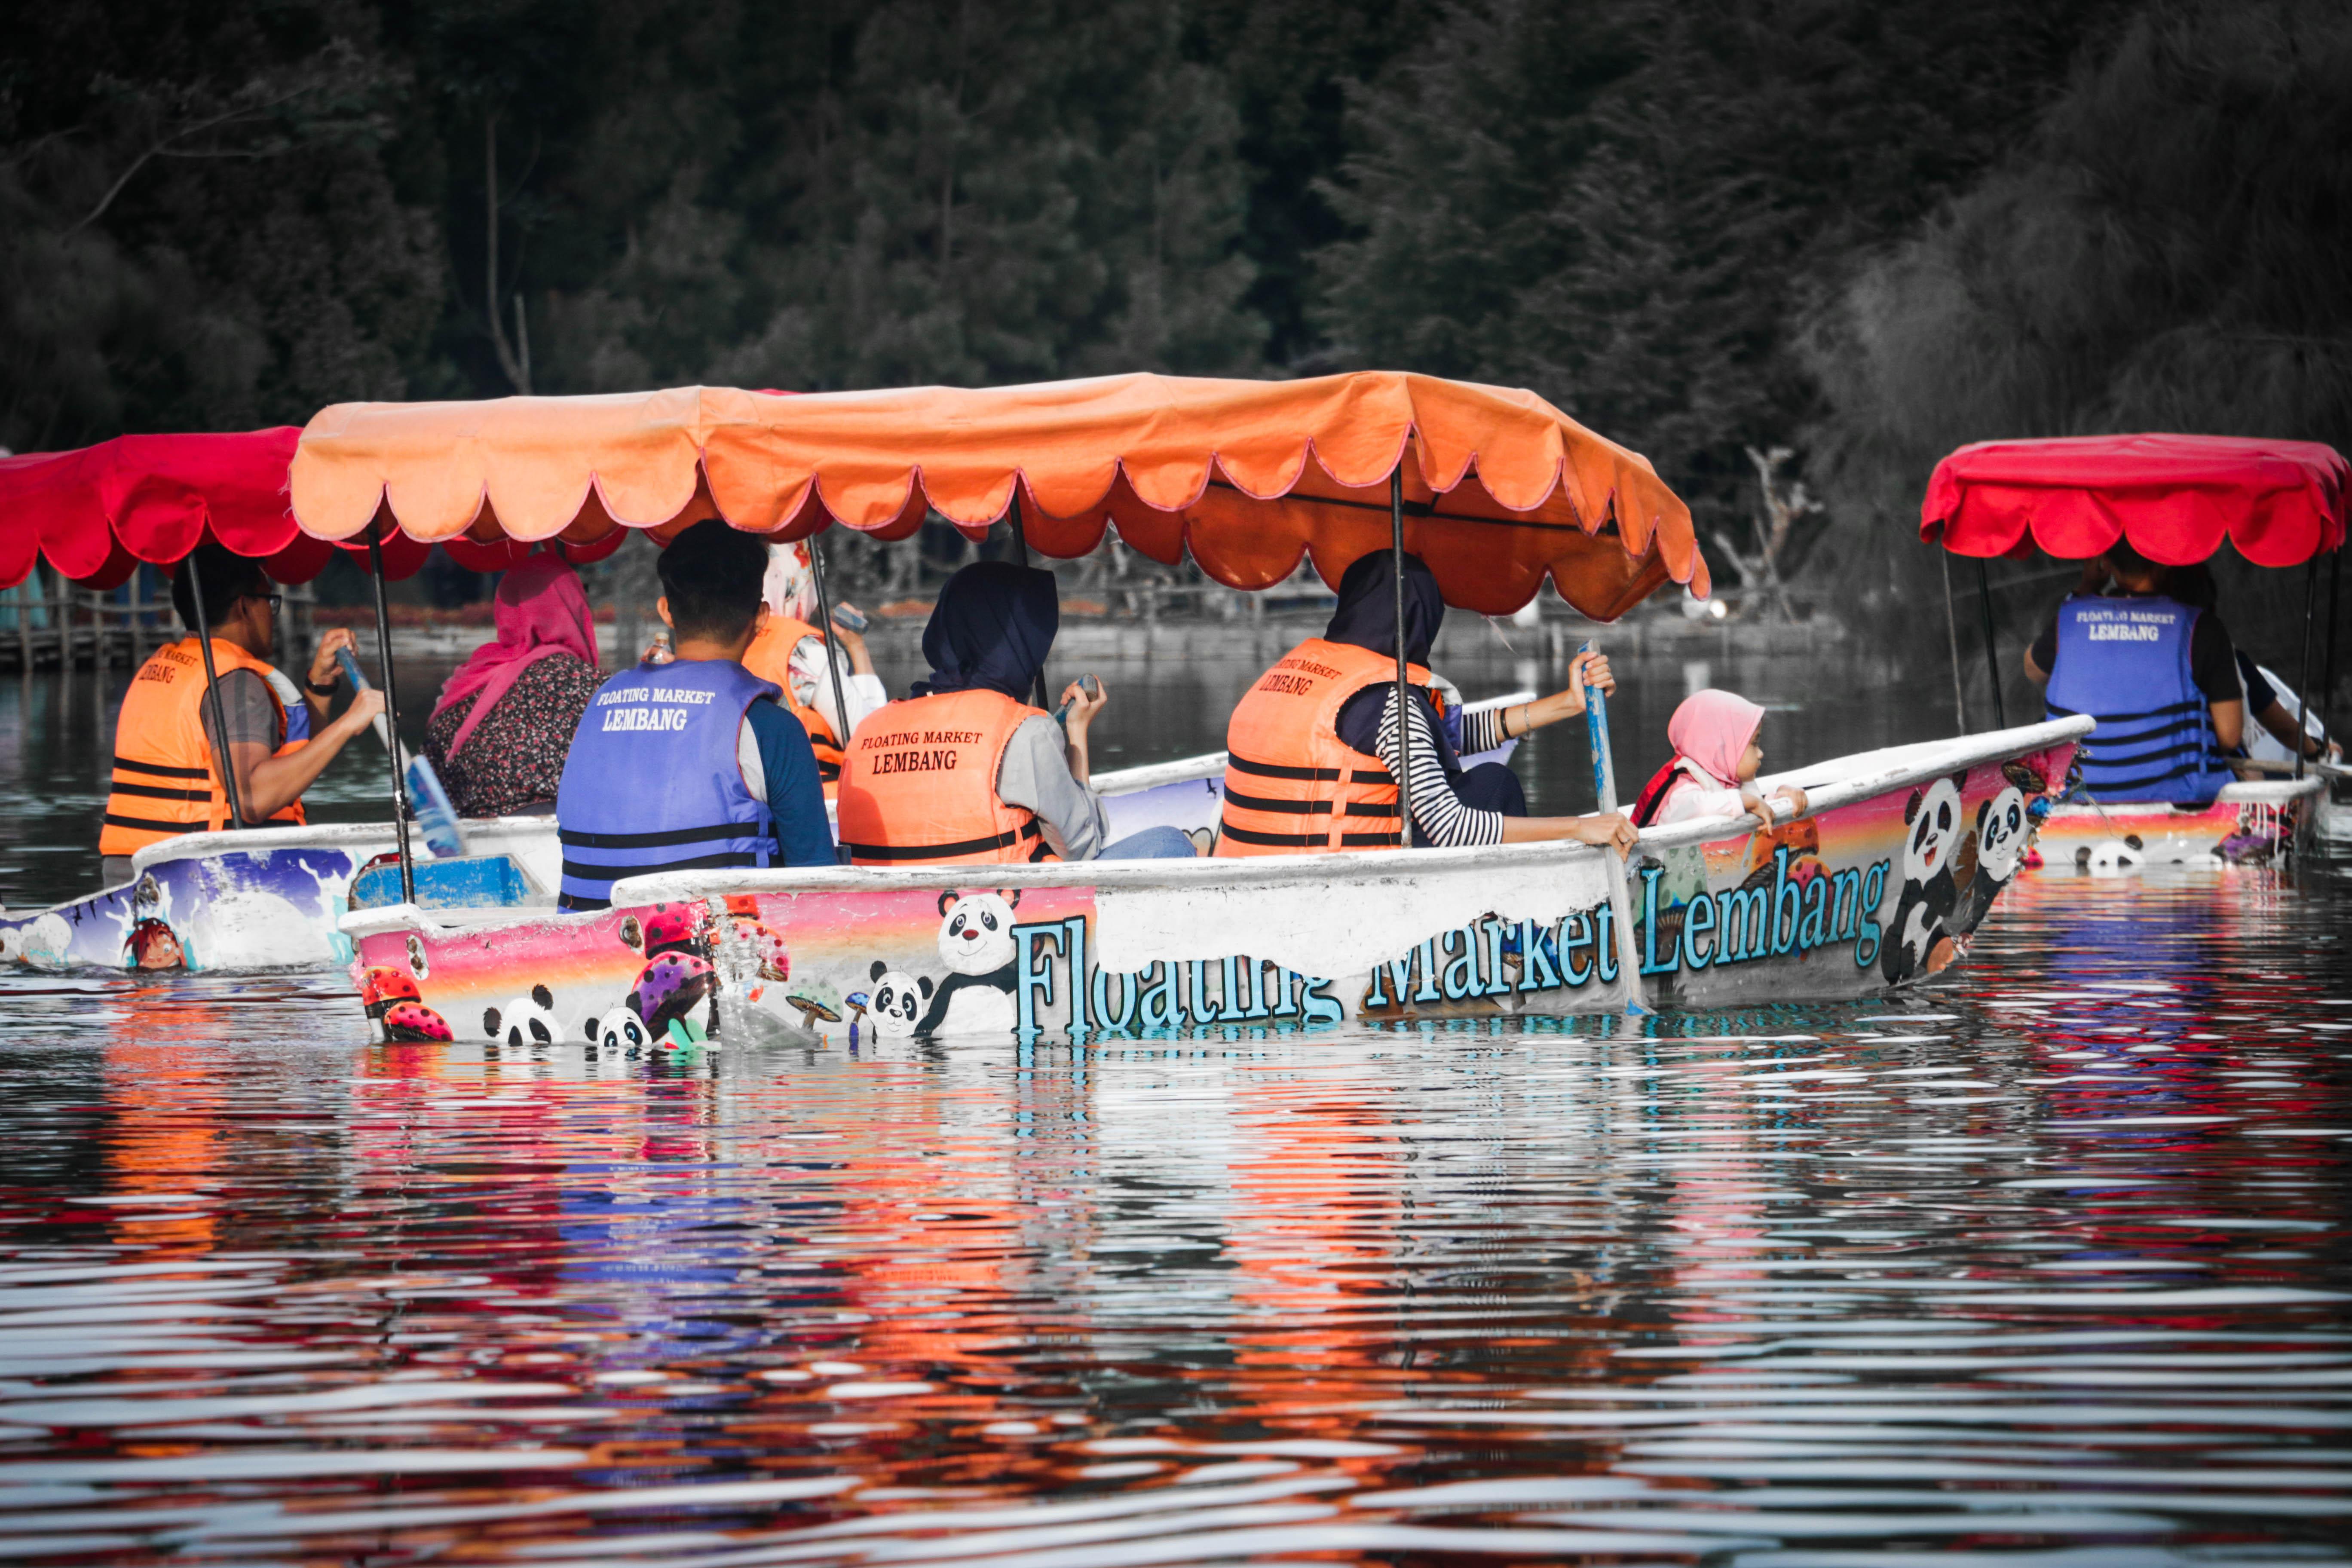 Floating Market Lembang Nikmati Jajanan Khas Sunda Wisata Pihak Pengelola